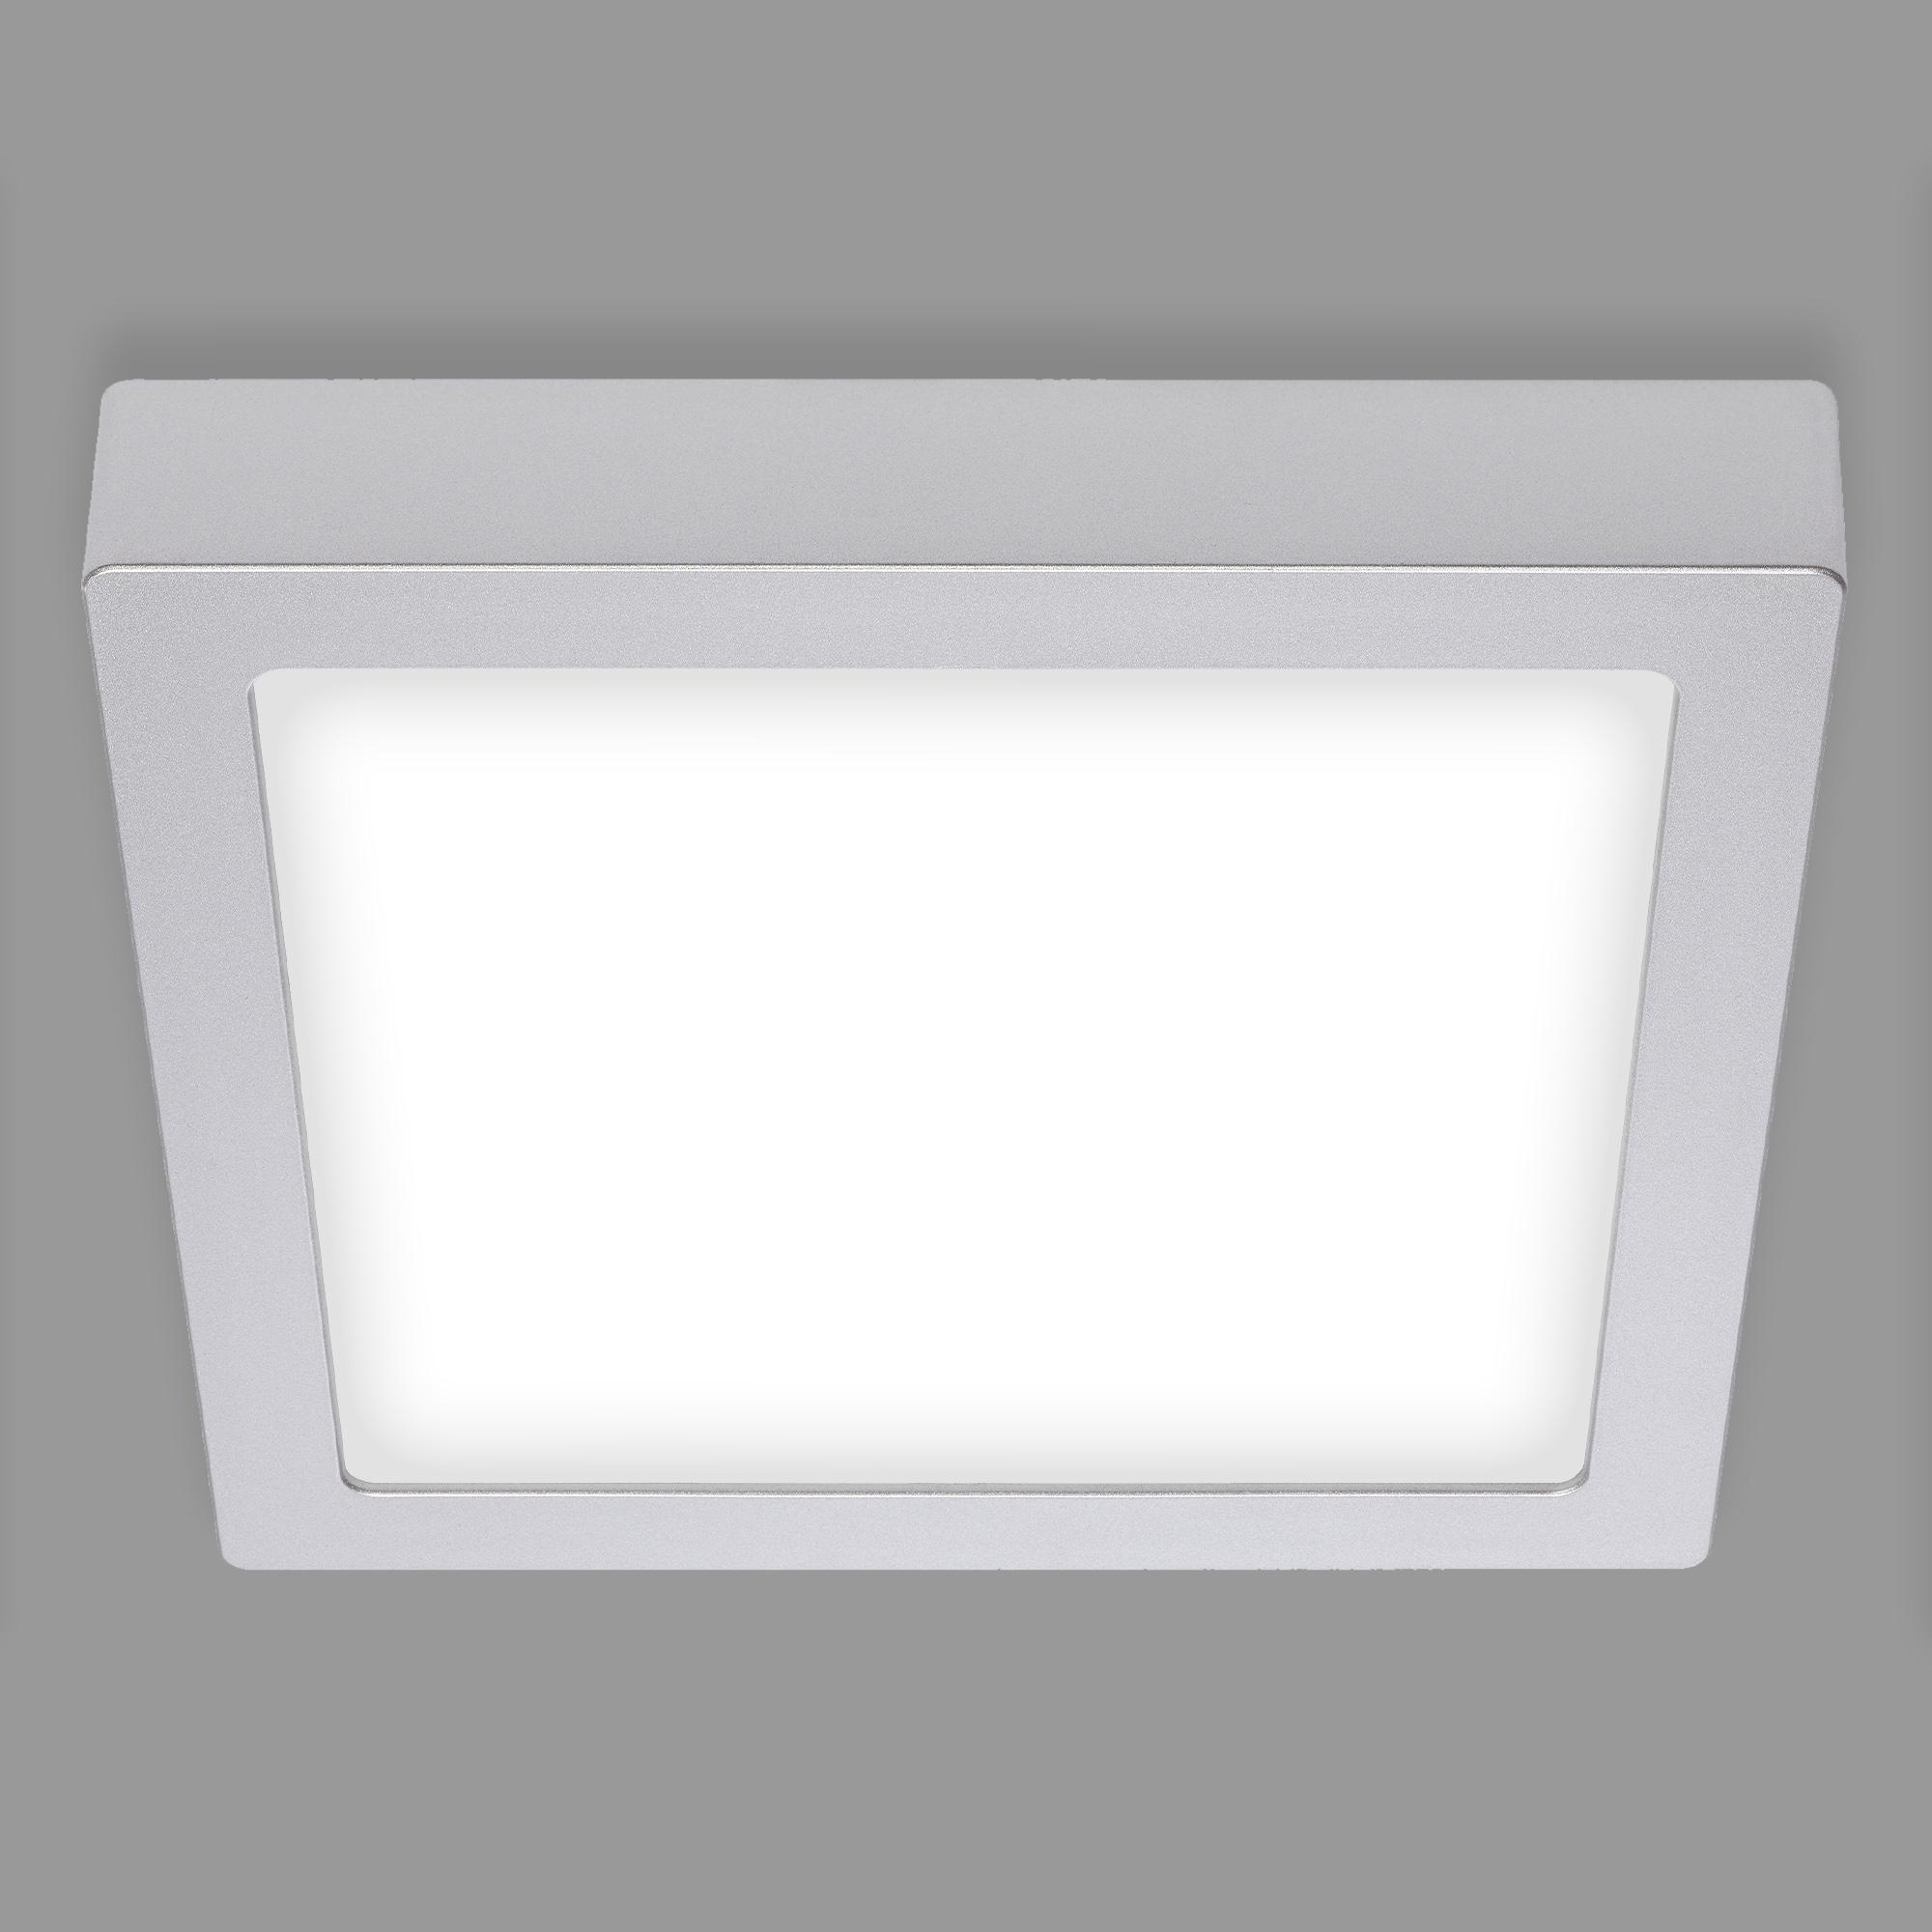 LED Deckenleuchte, 22,5 cm, 17 W, Chrom-Matt